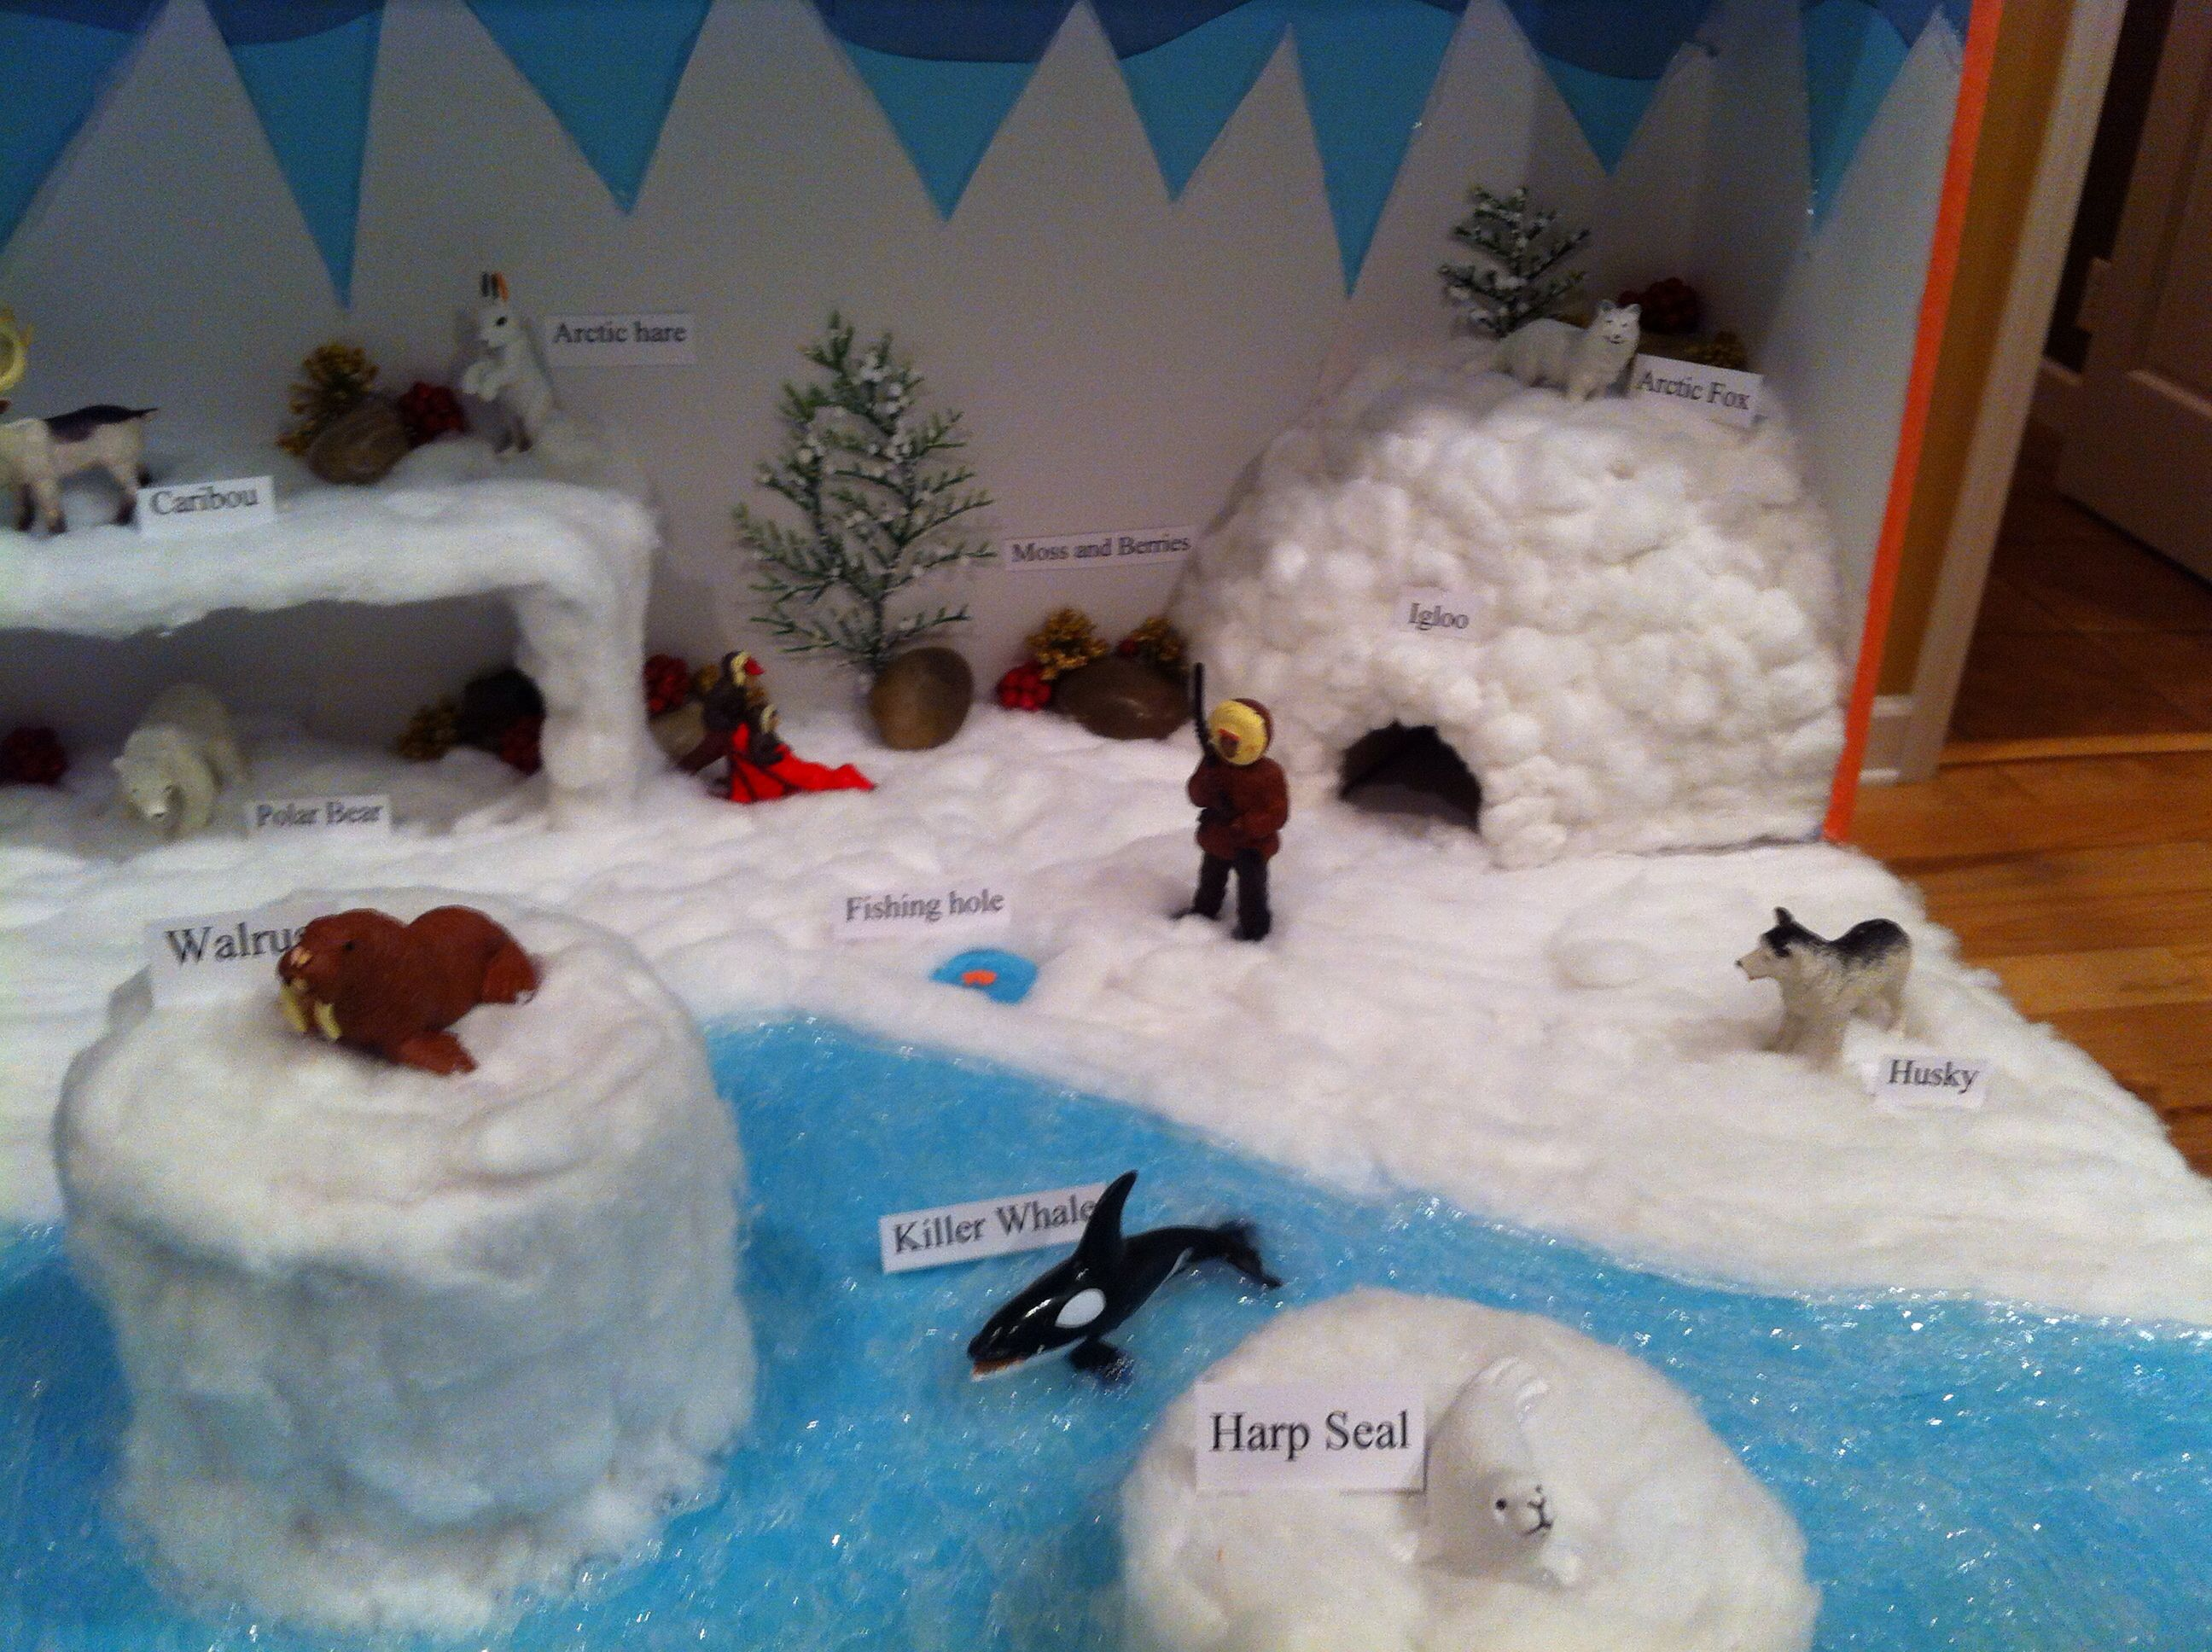 Arctic Tundra Diorama